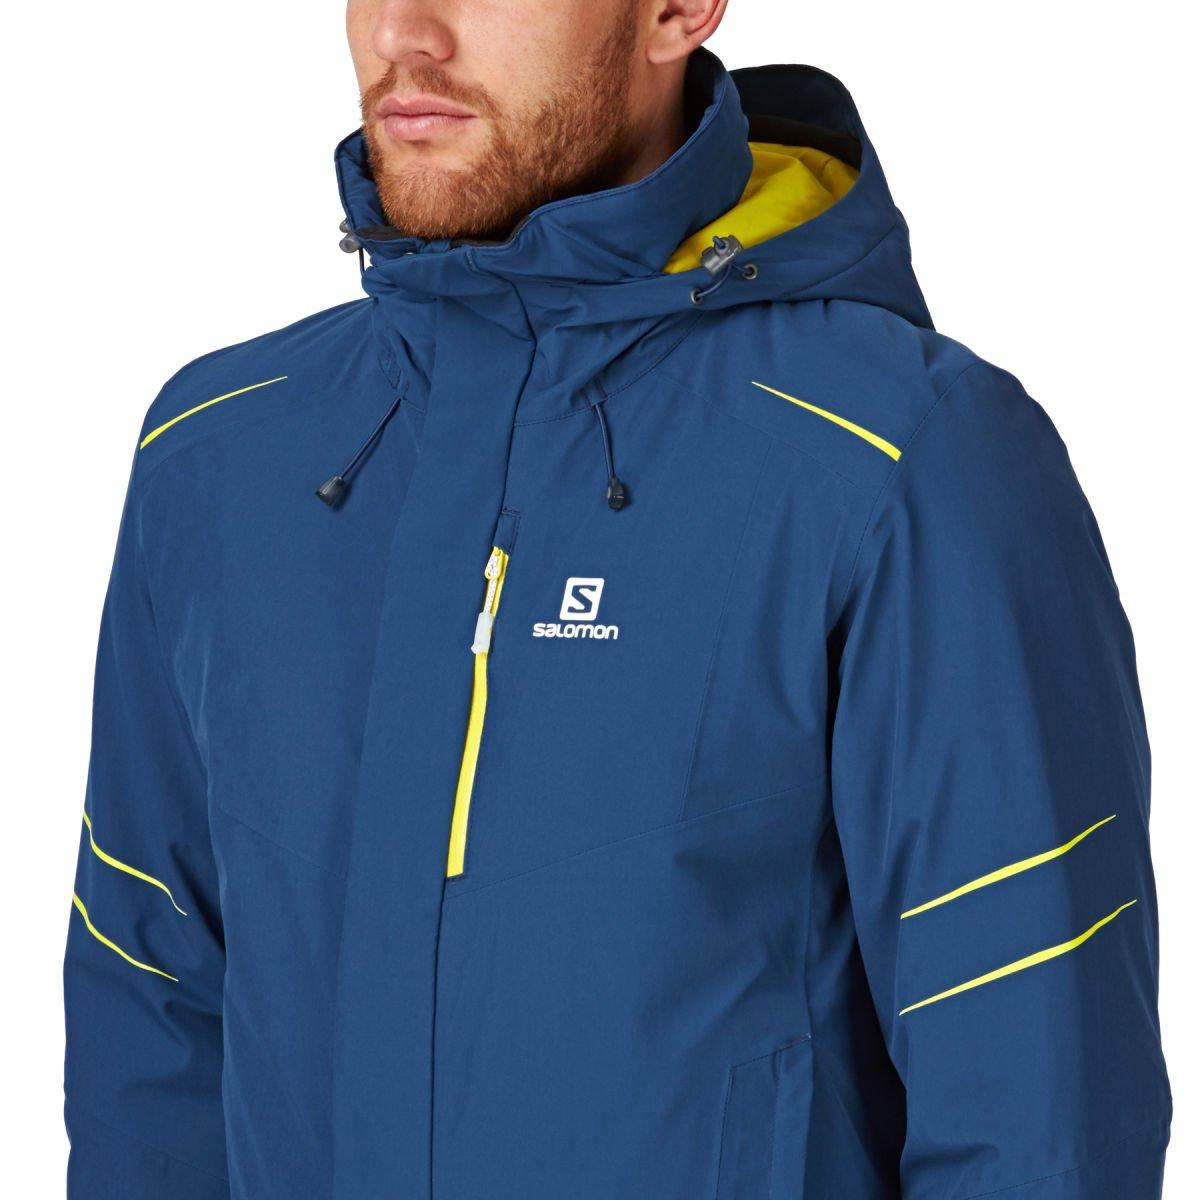 7315ed286888 Salomon Icestorm Jacket M Snow Jacket - Midnight Blue  Amazon.ca  Clothing    Accessories